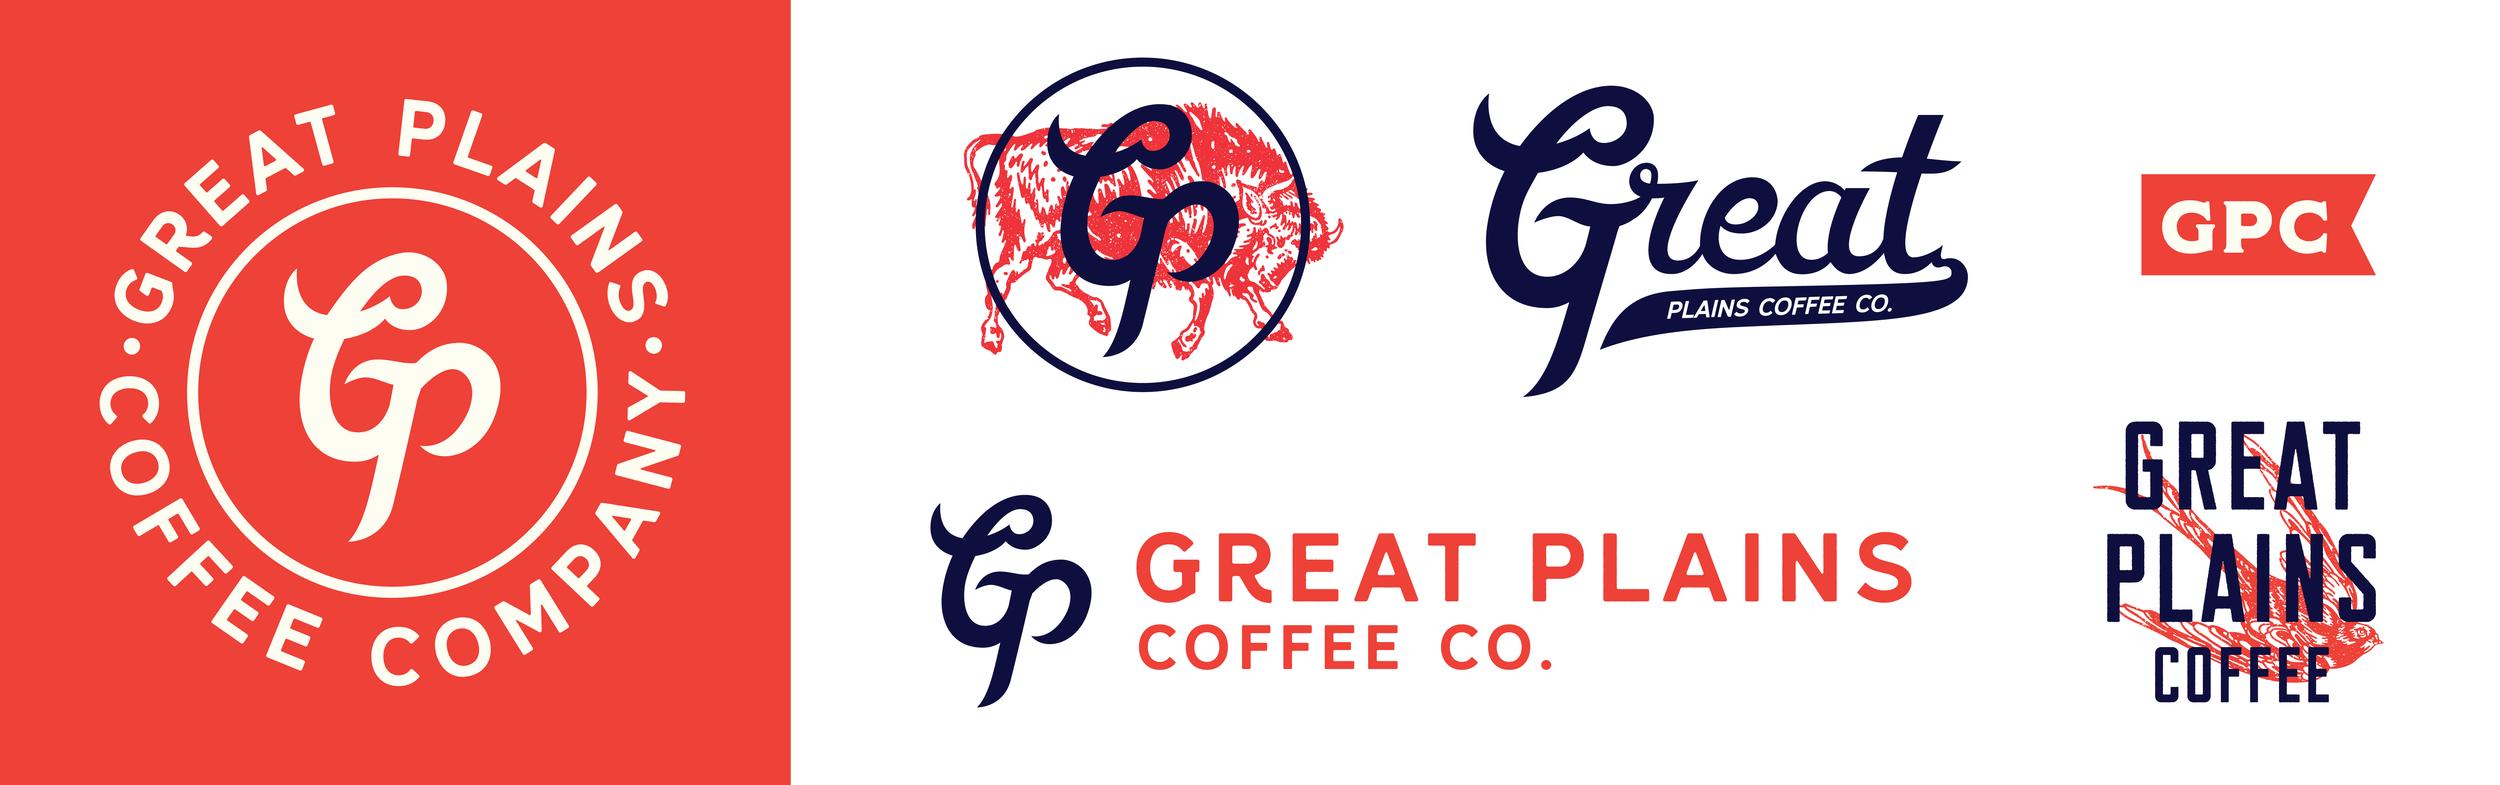 great plains-0a7-07.png